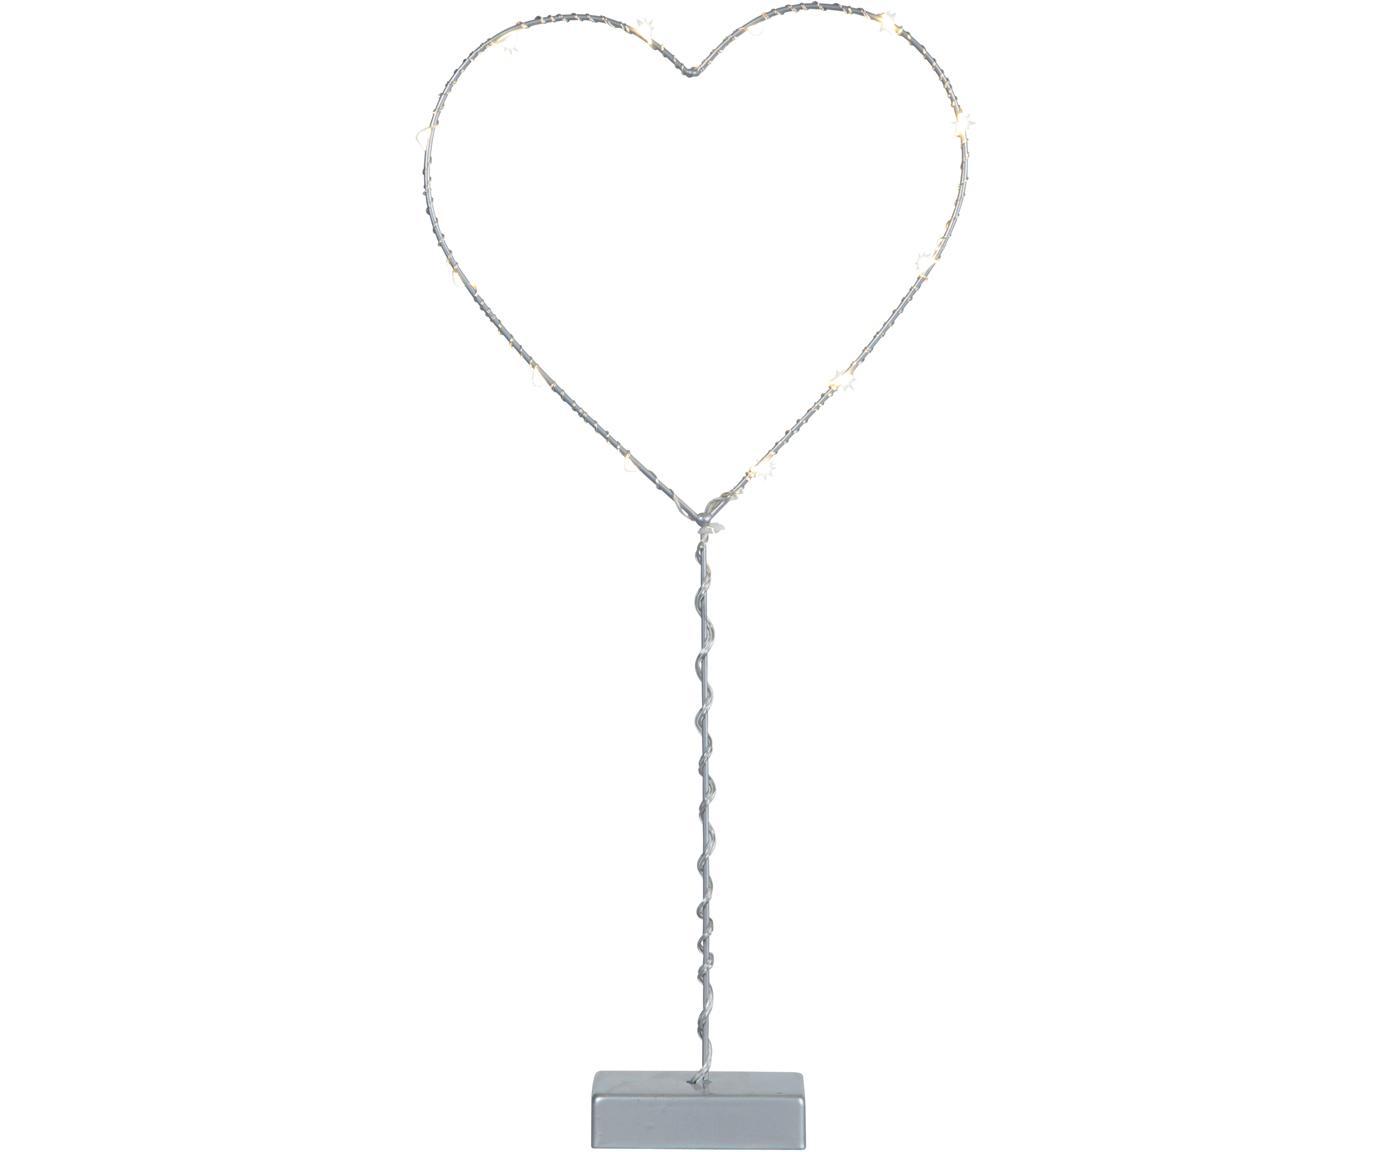 LED Leuchtobjekt Heart, batteriebetrieben, Grau, 20 x 43 cm